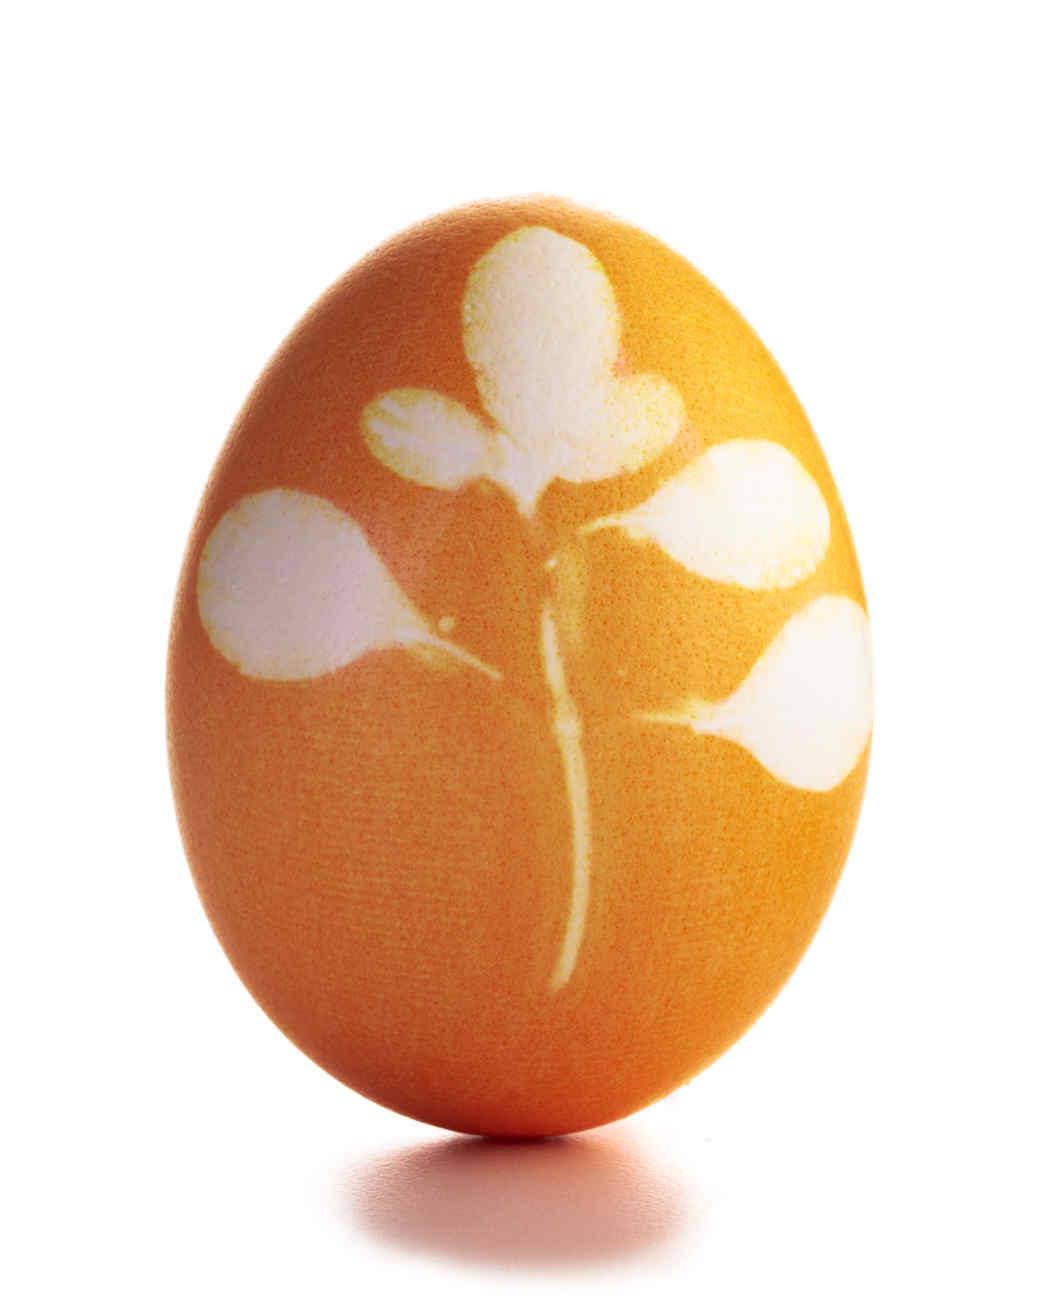 egg-dyeing-app-d107182-masking-2orange-botanical0414.jpg